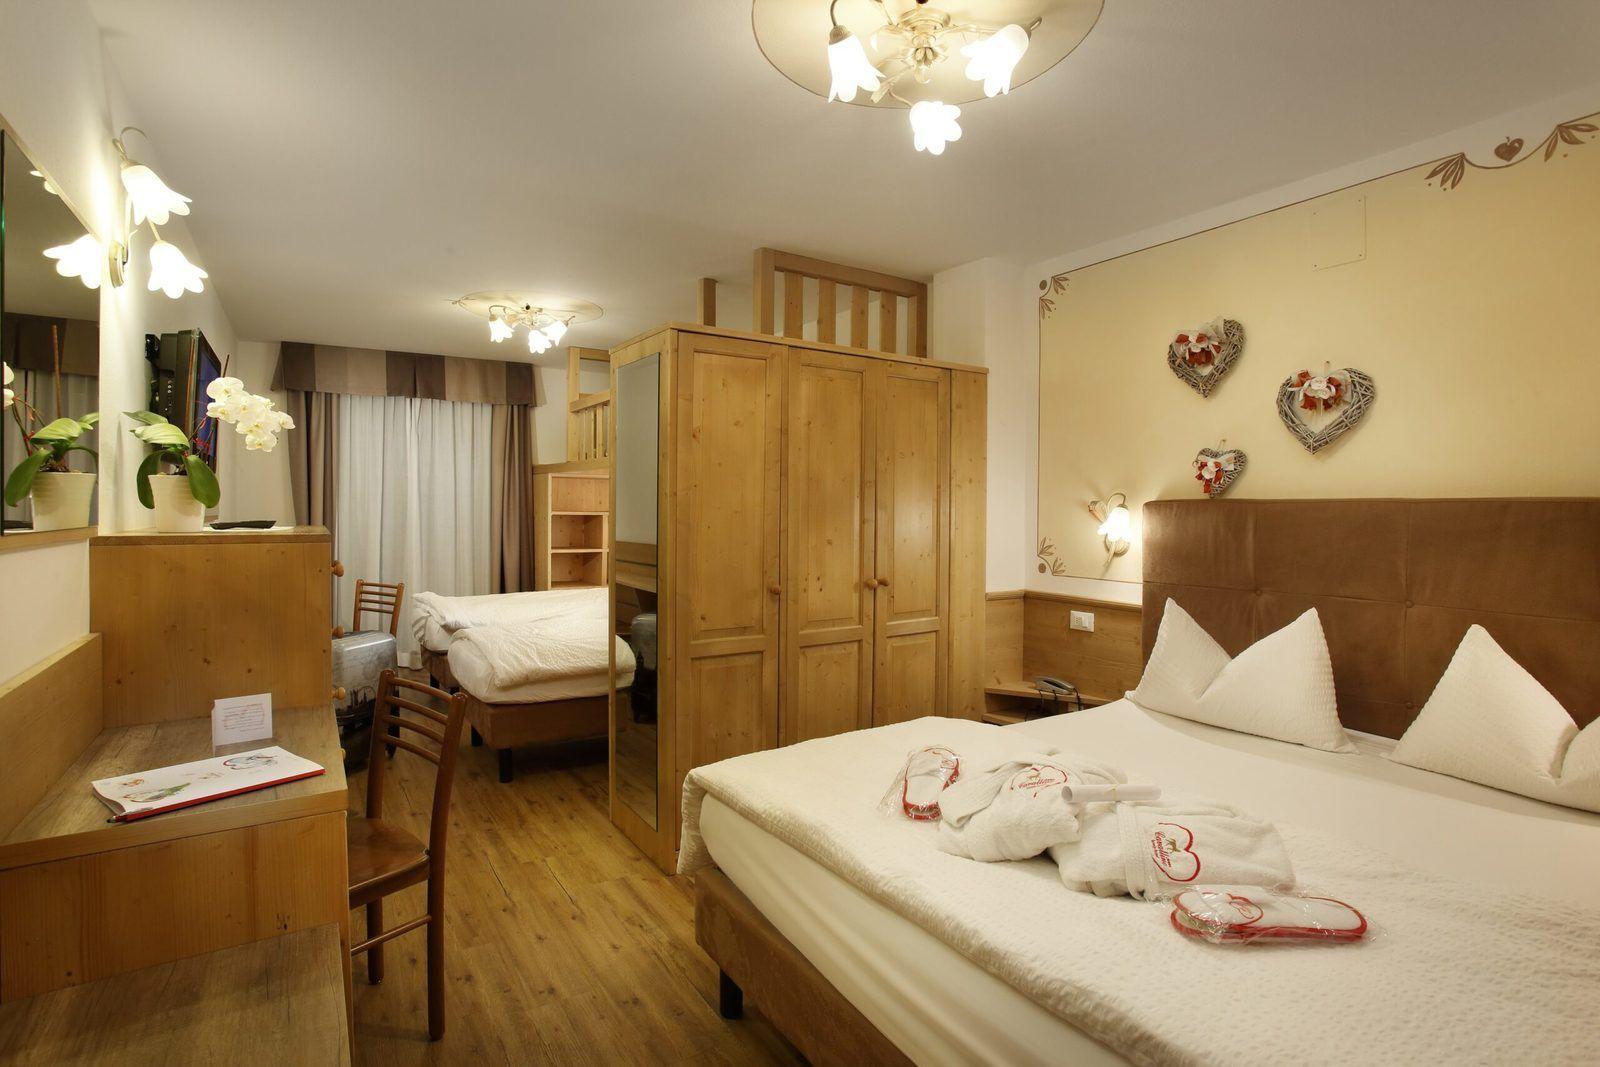 The Harmony room of Hotel Cavallino in Andalo